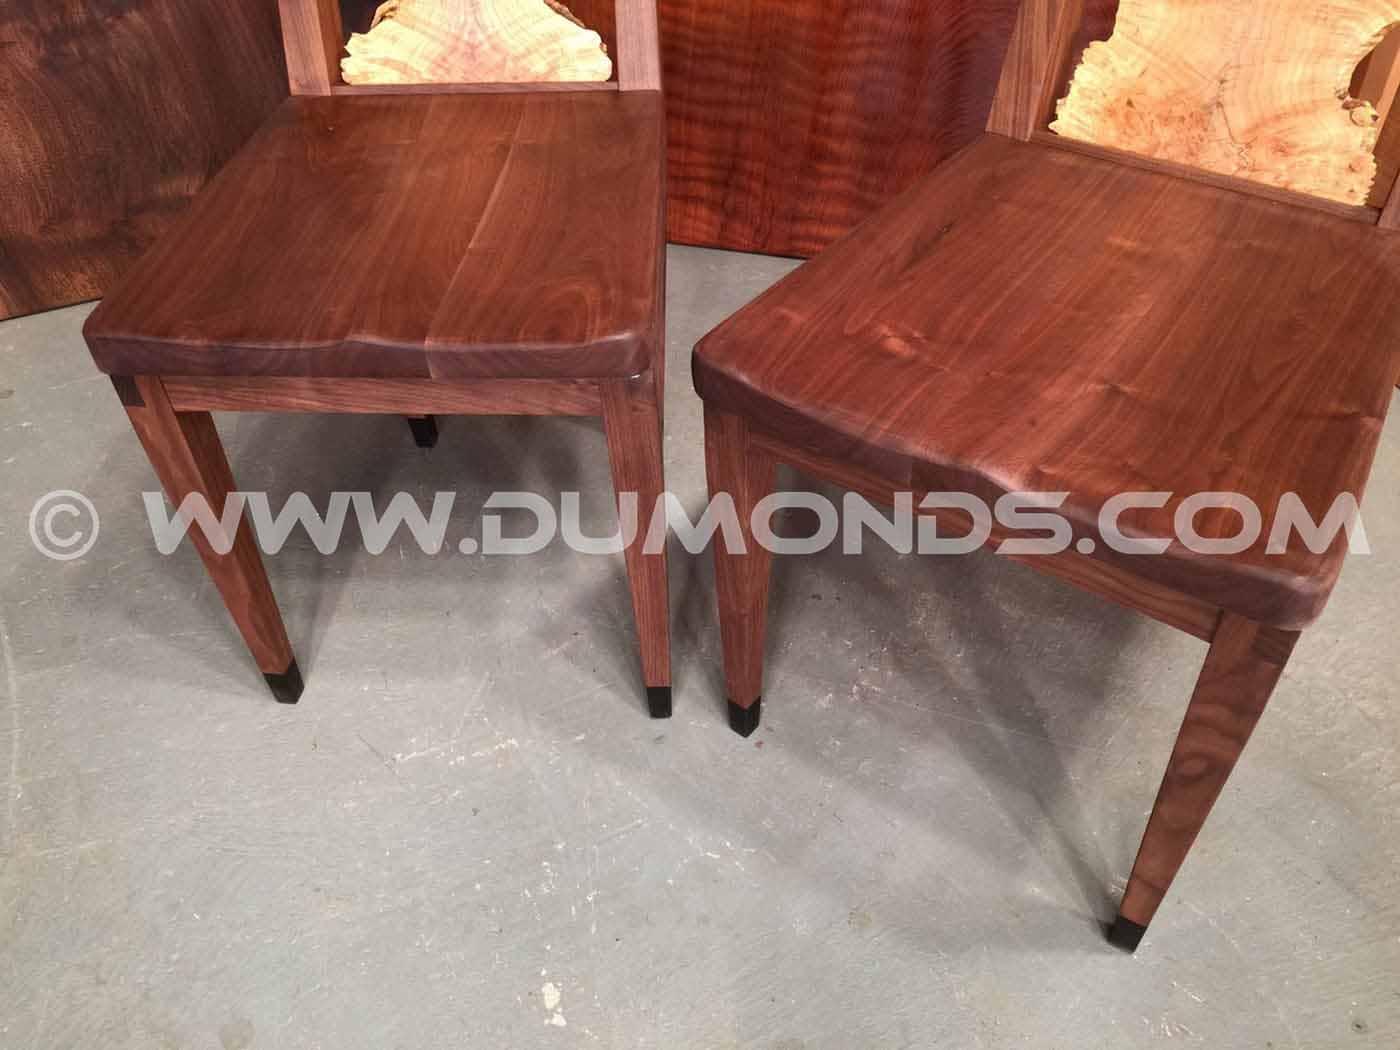 Custom Wood Dining Chairs Dumond S Custom Furniture